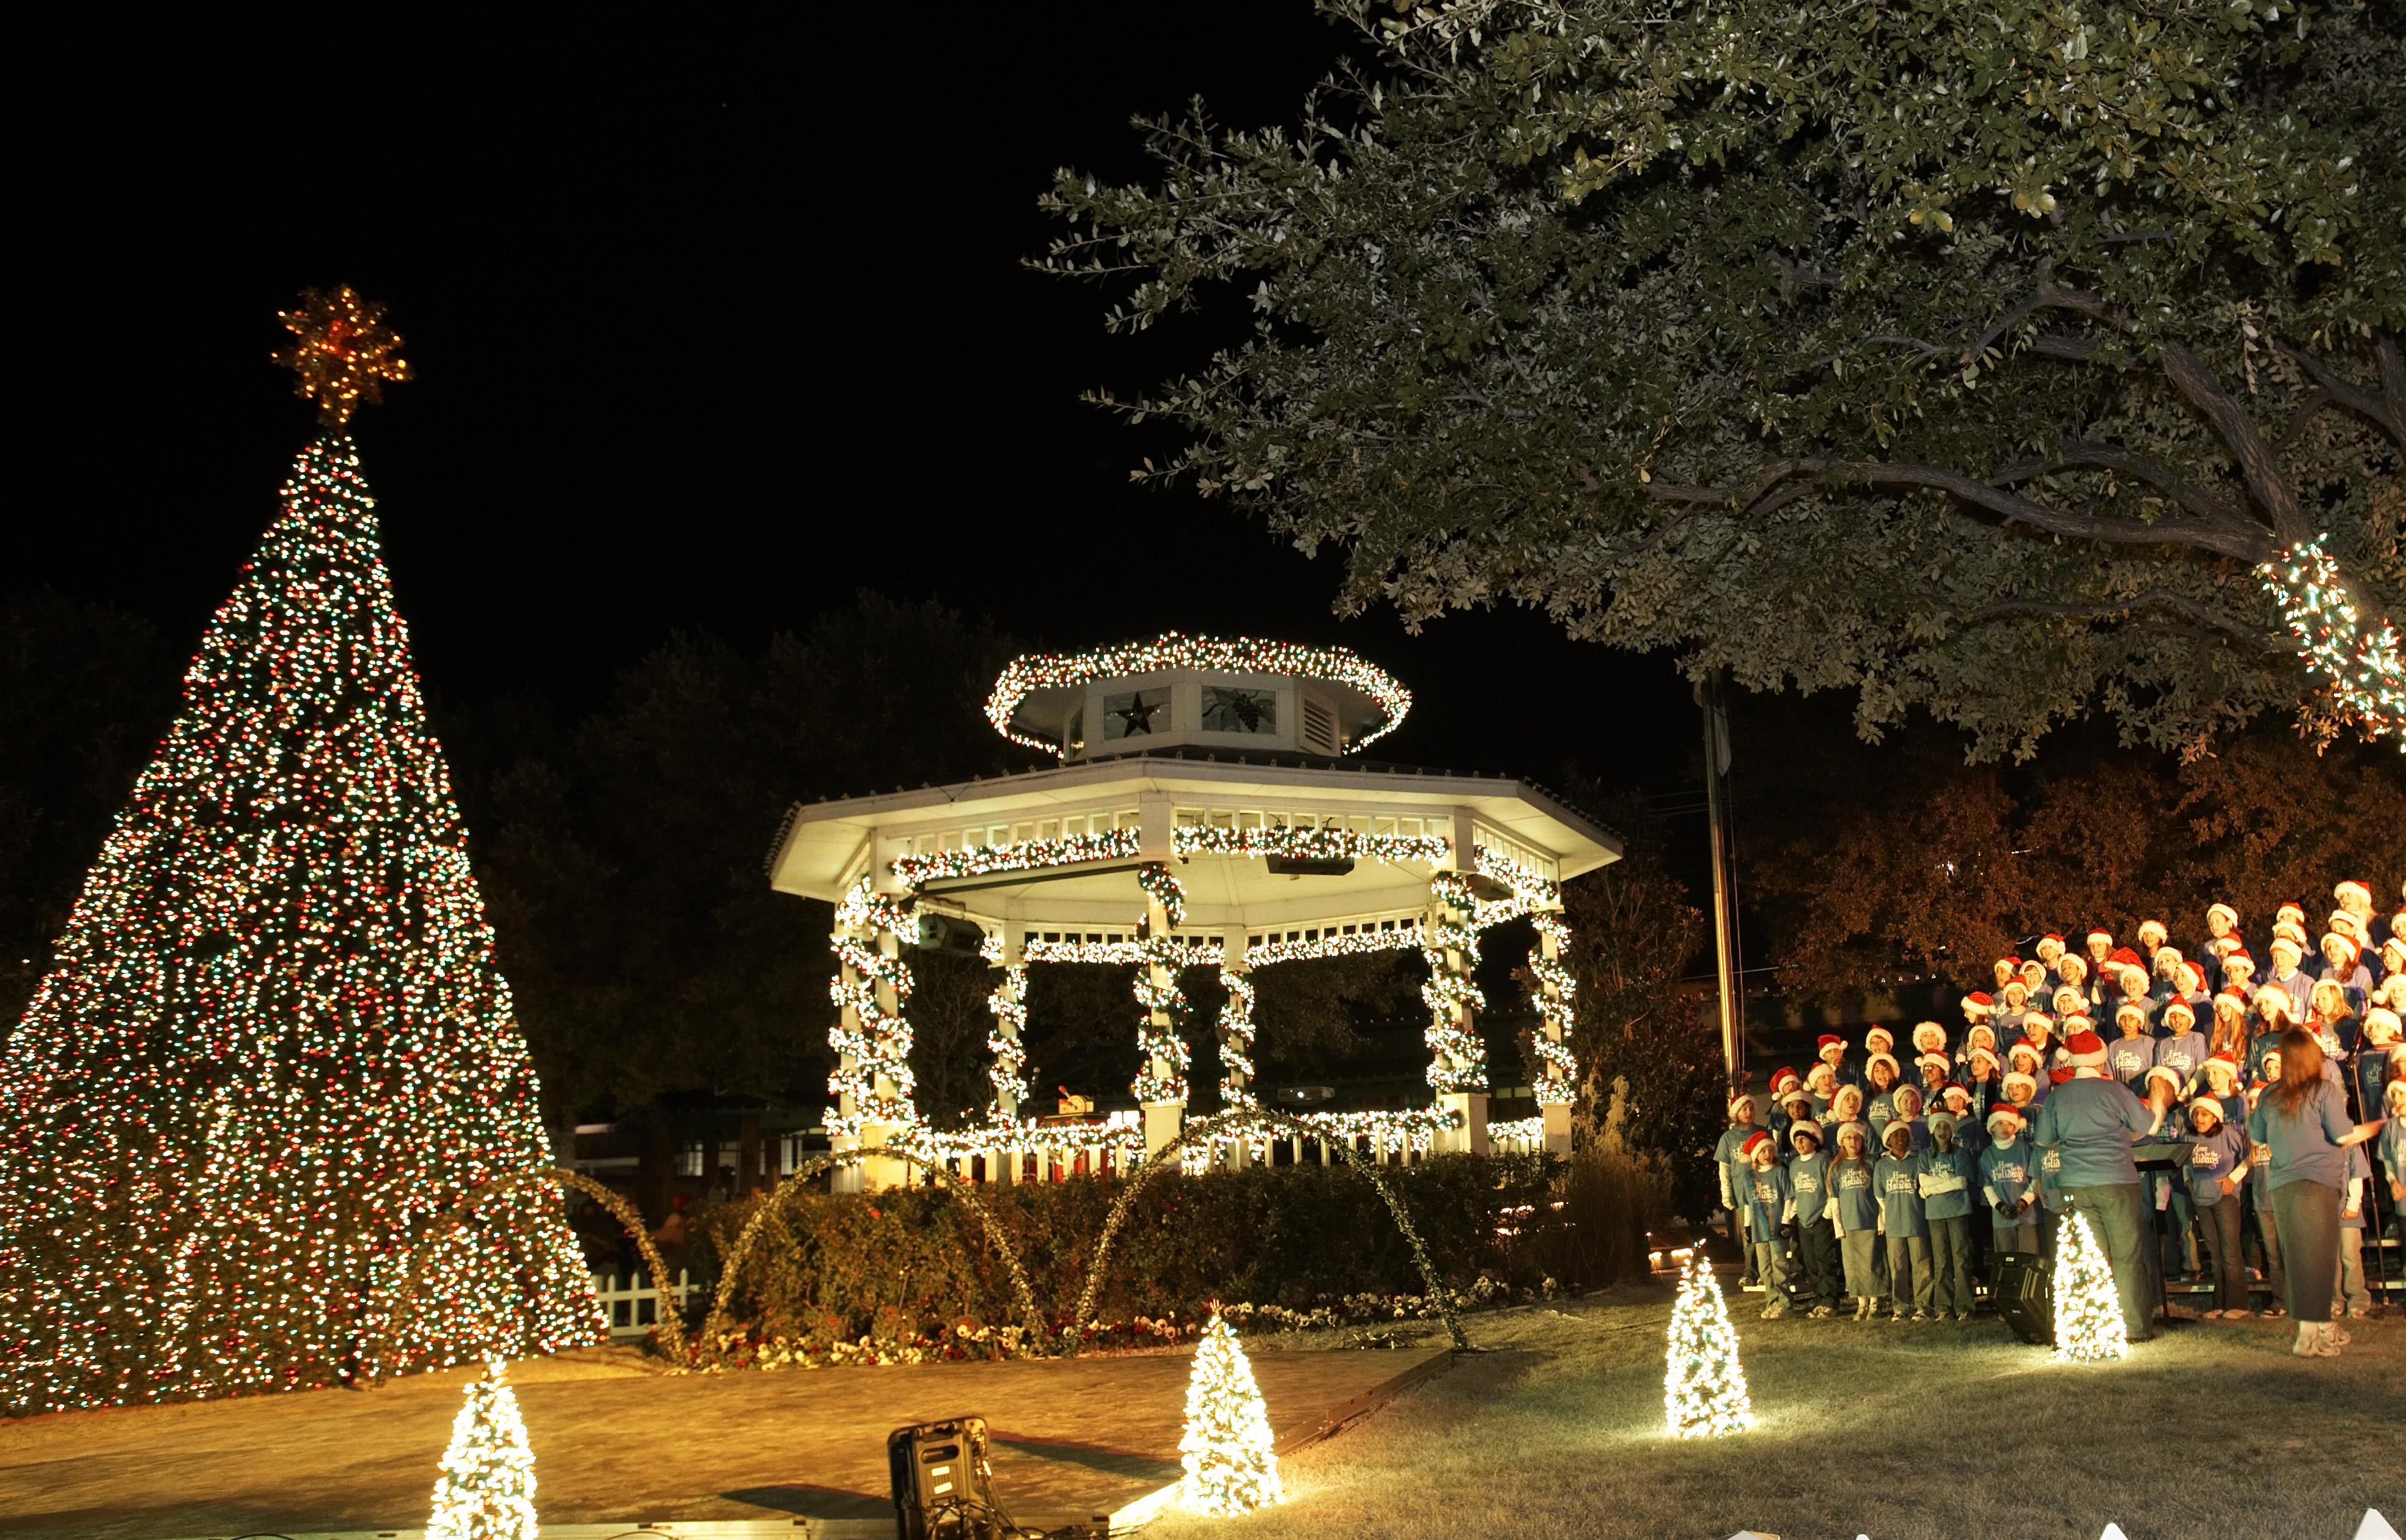 1400 reasons to visit Grapevine, TX this holiday season - Just ...